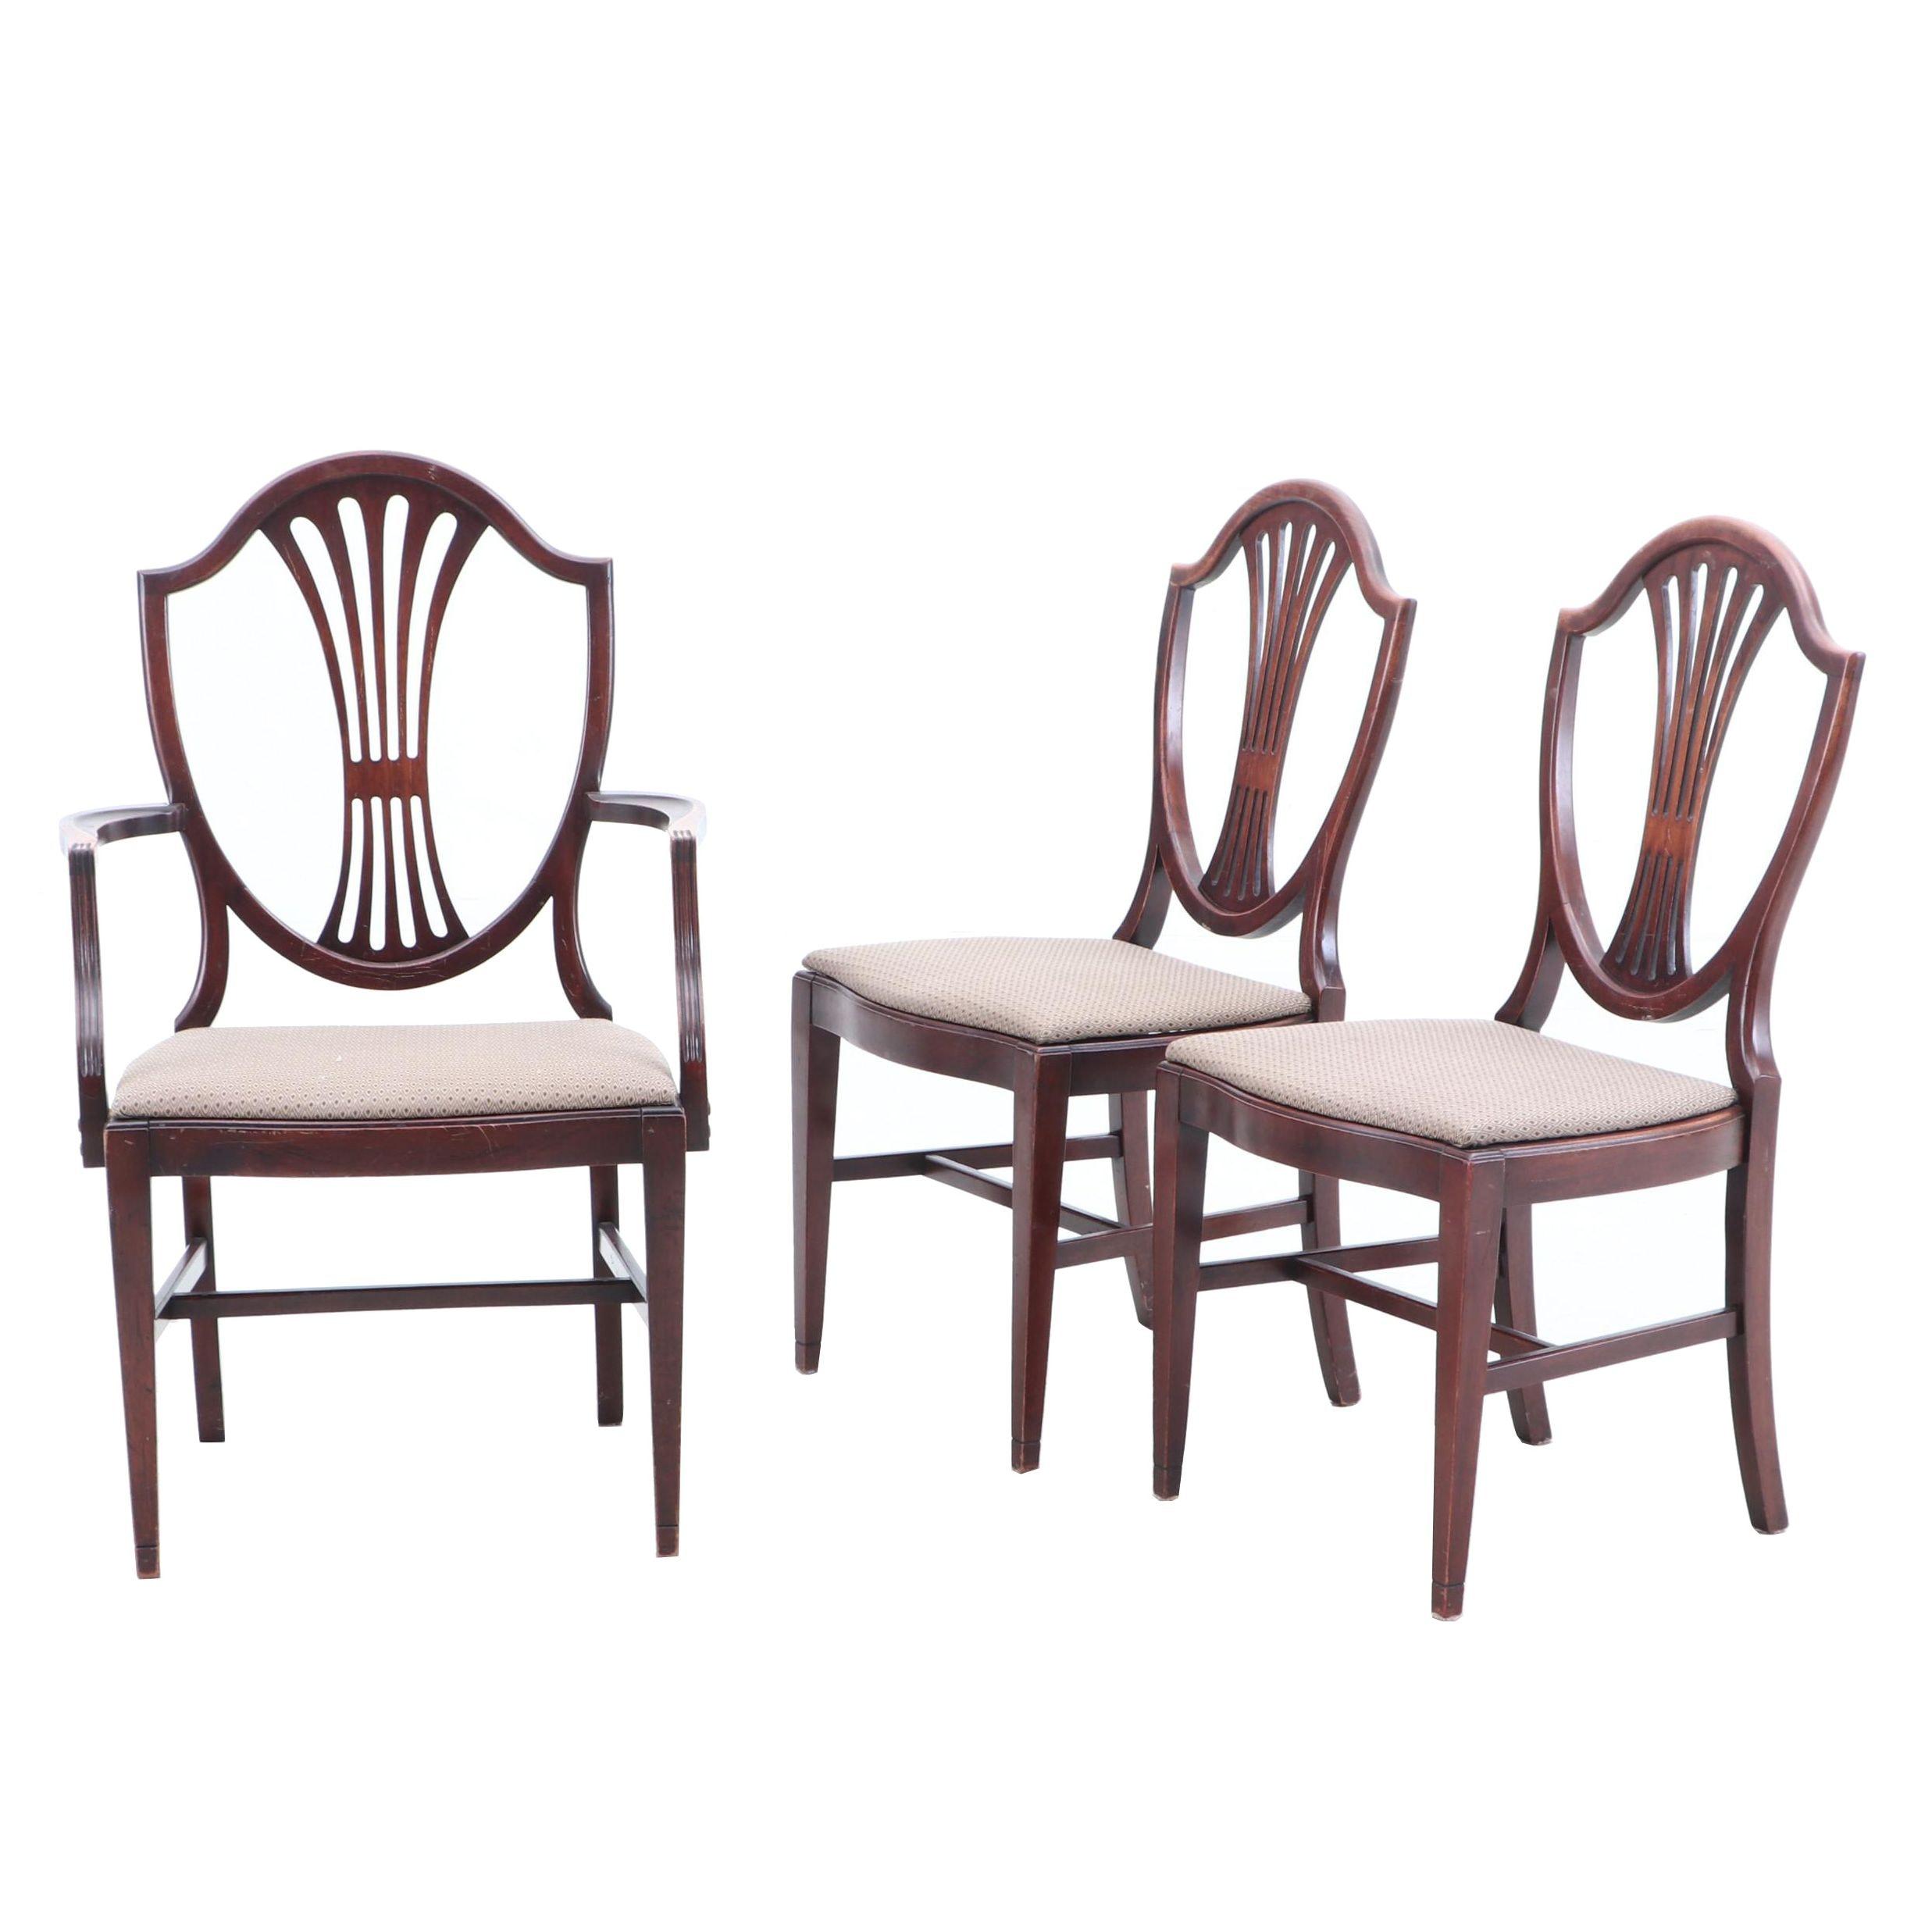 Sheraton Shieldback Style Mahogany Side Chairs, Late 20th Century